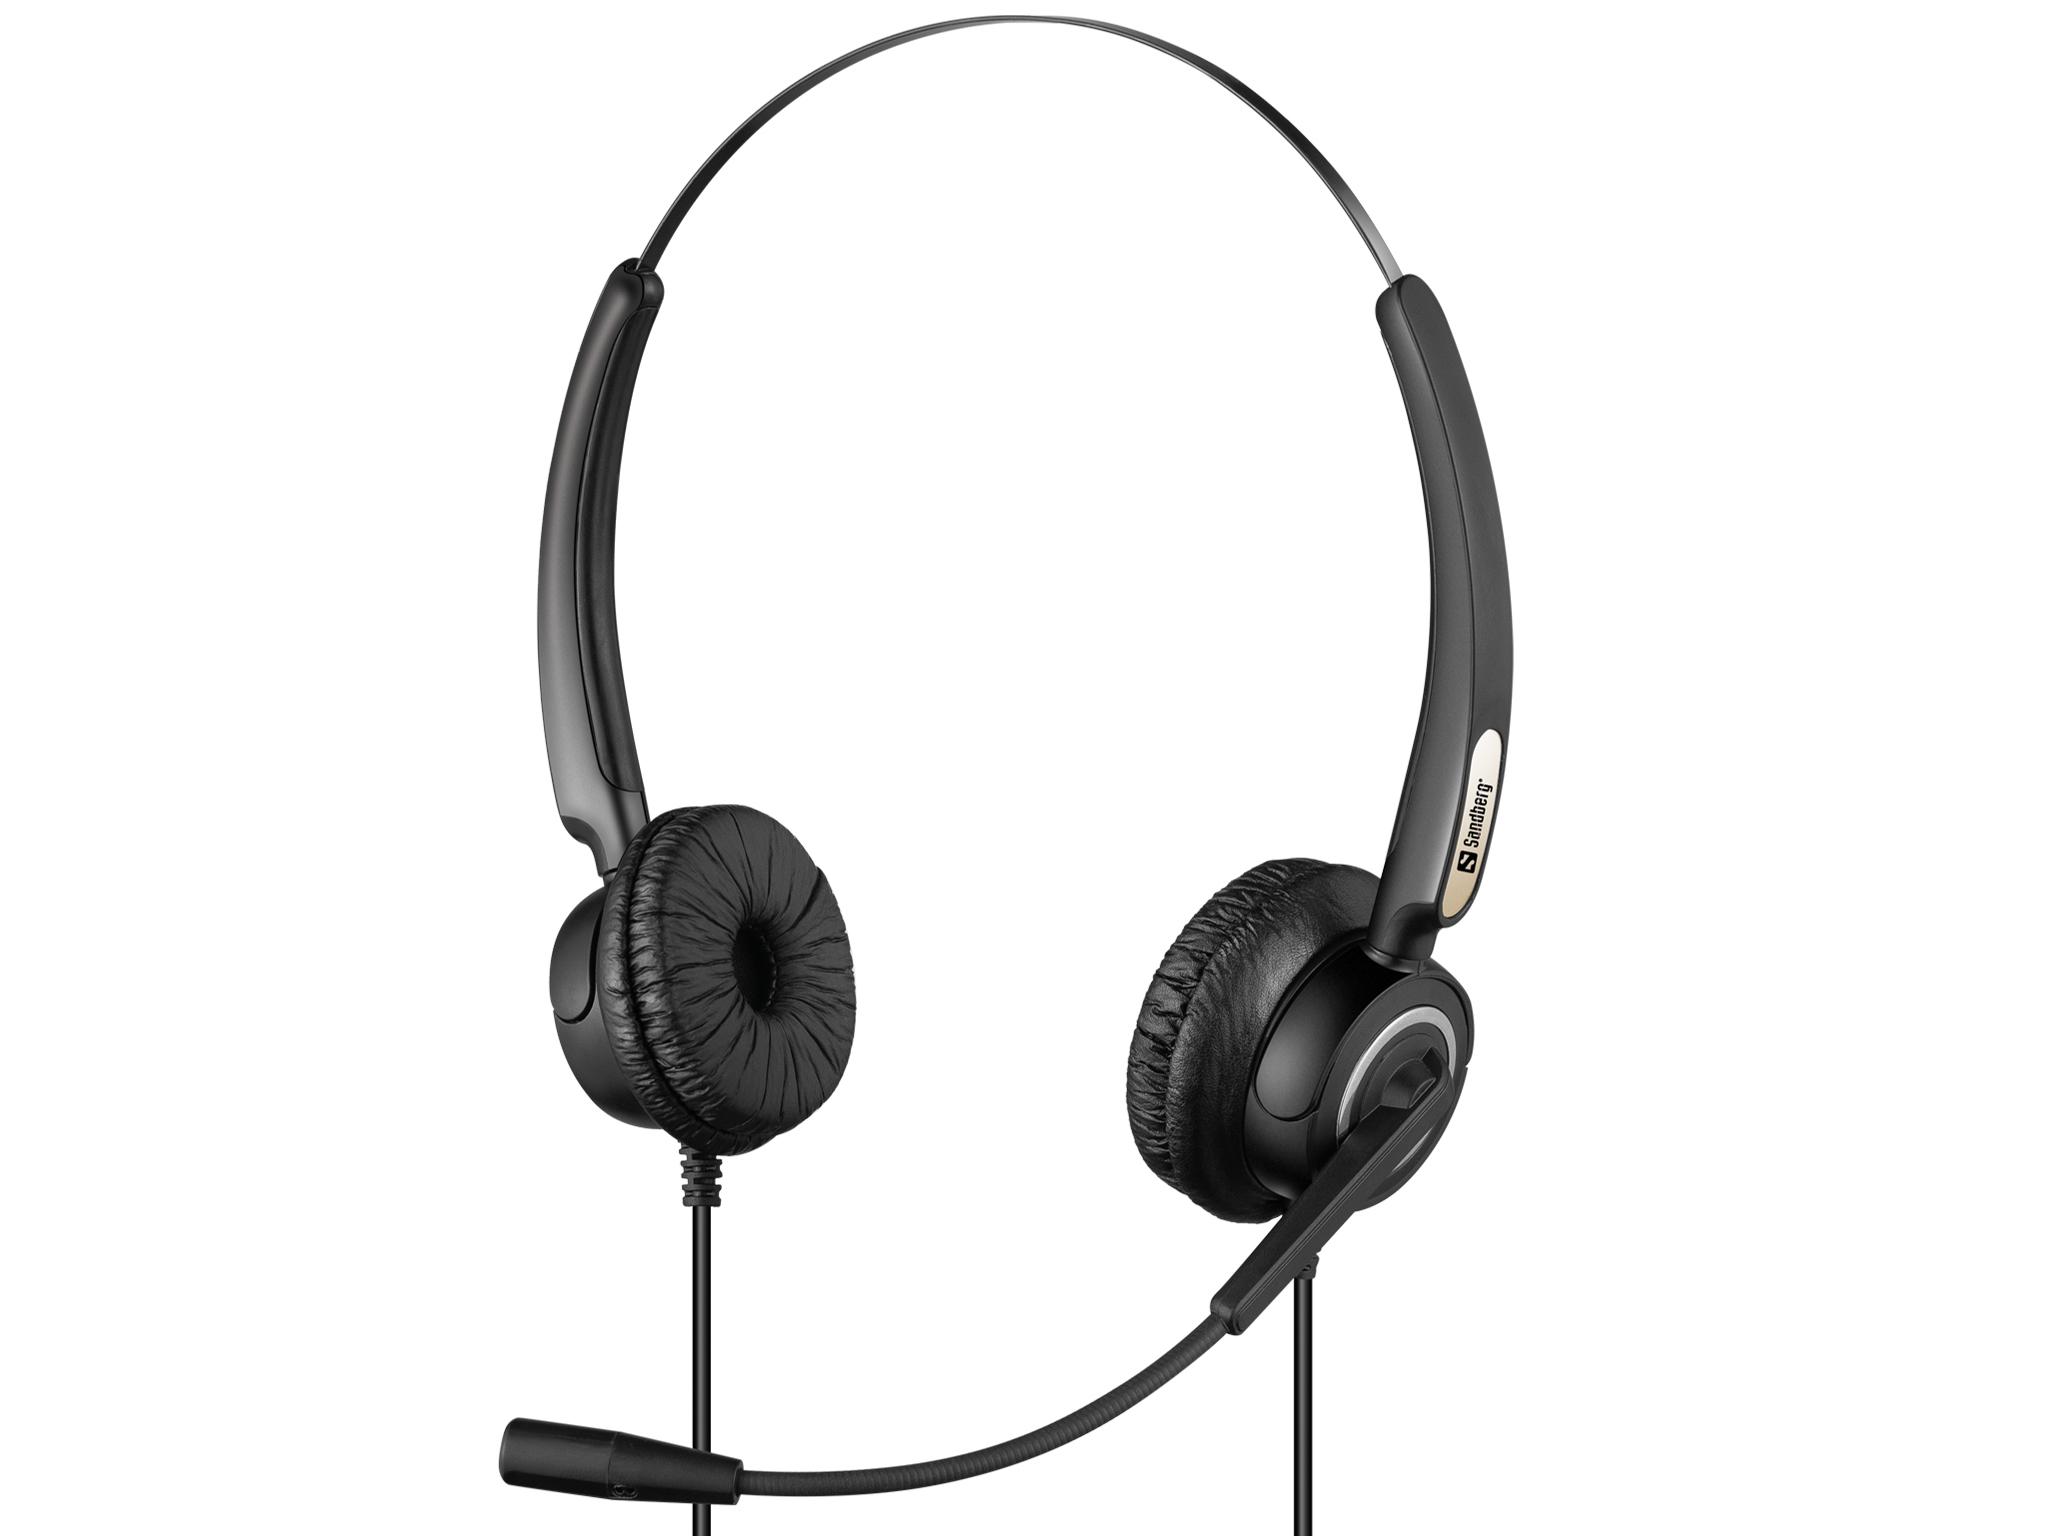 Sandberg USB Office Headset Pro Stereo